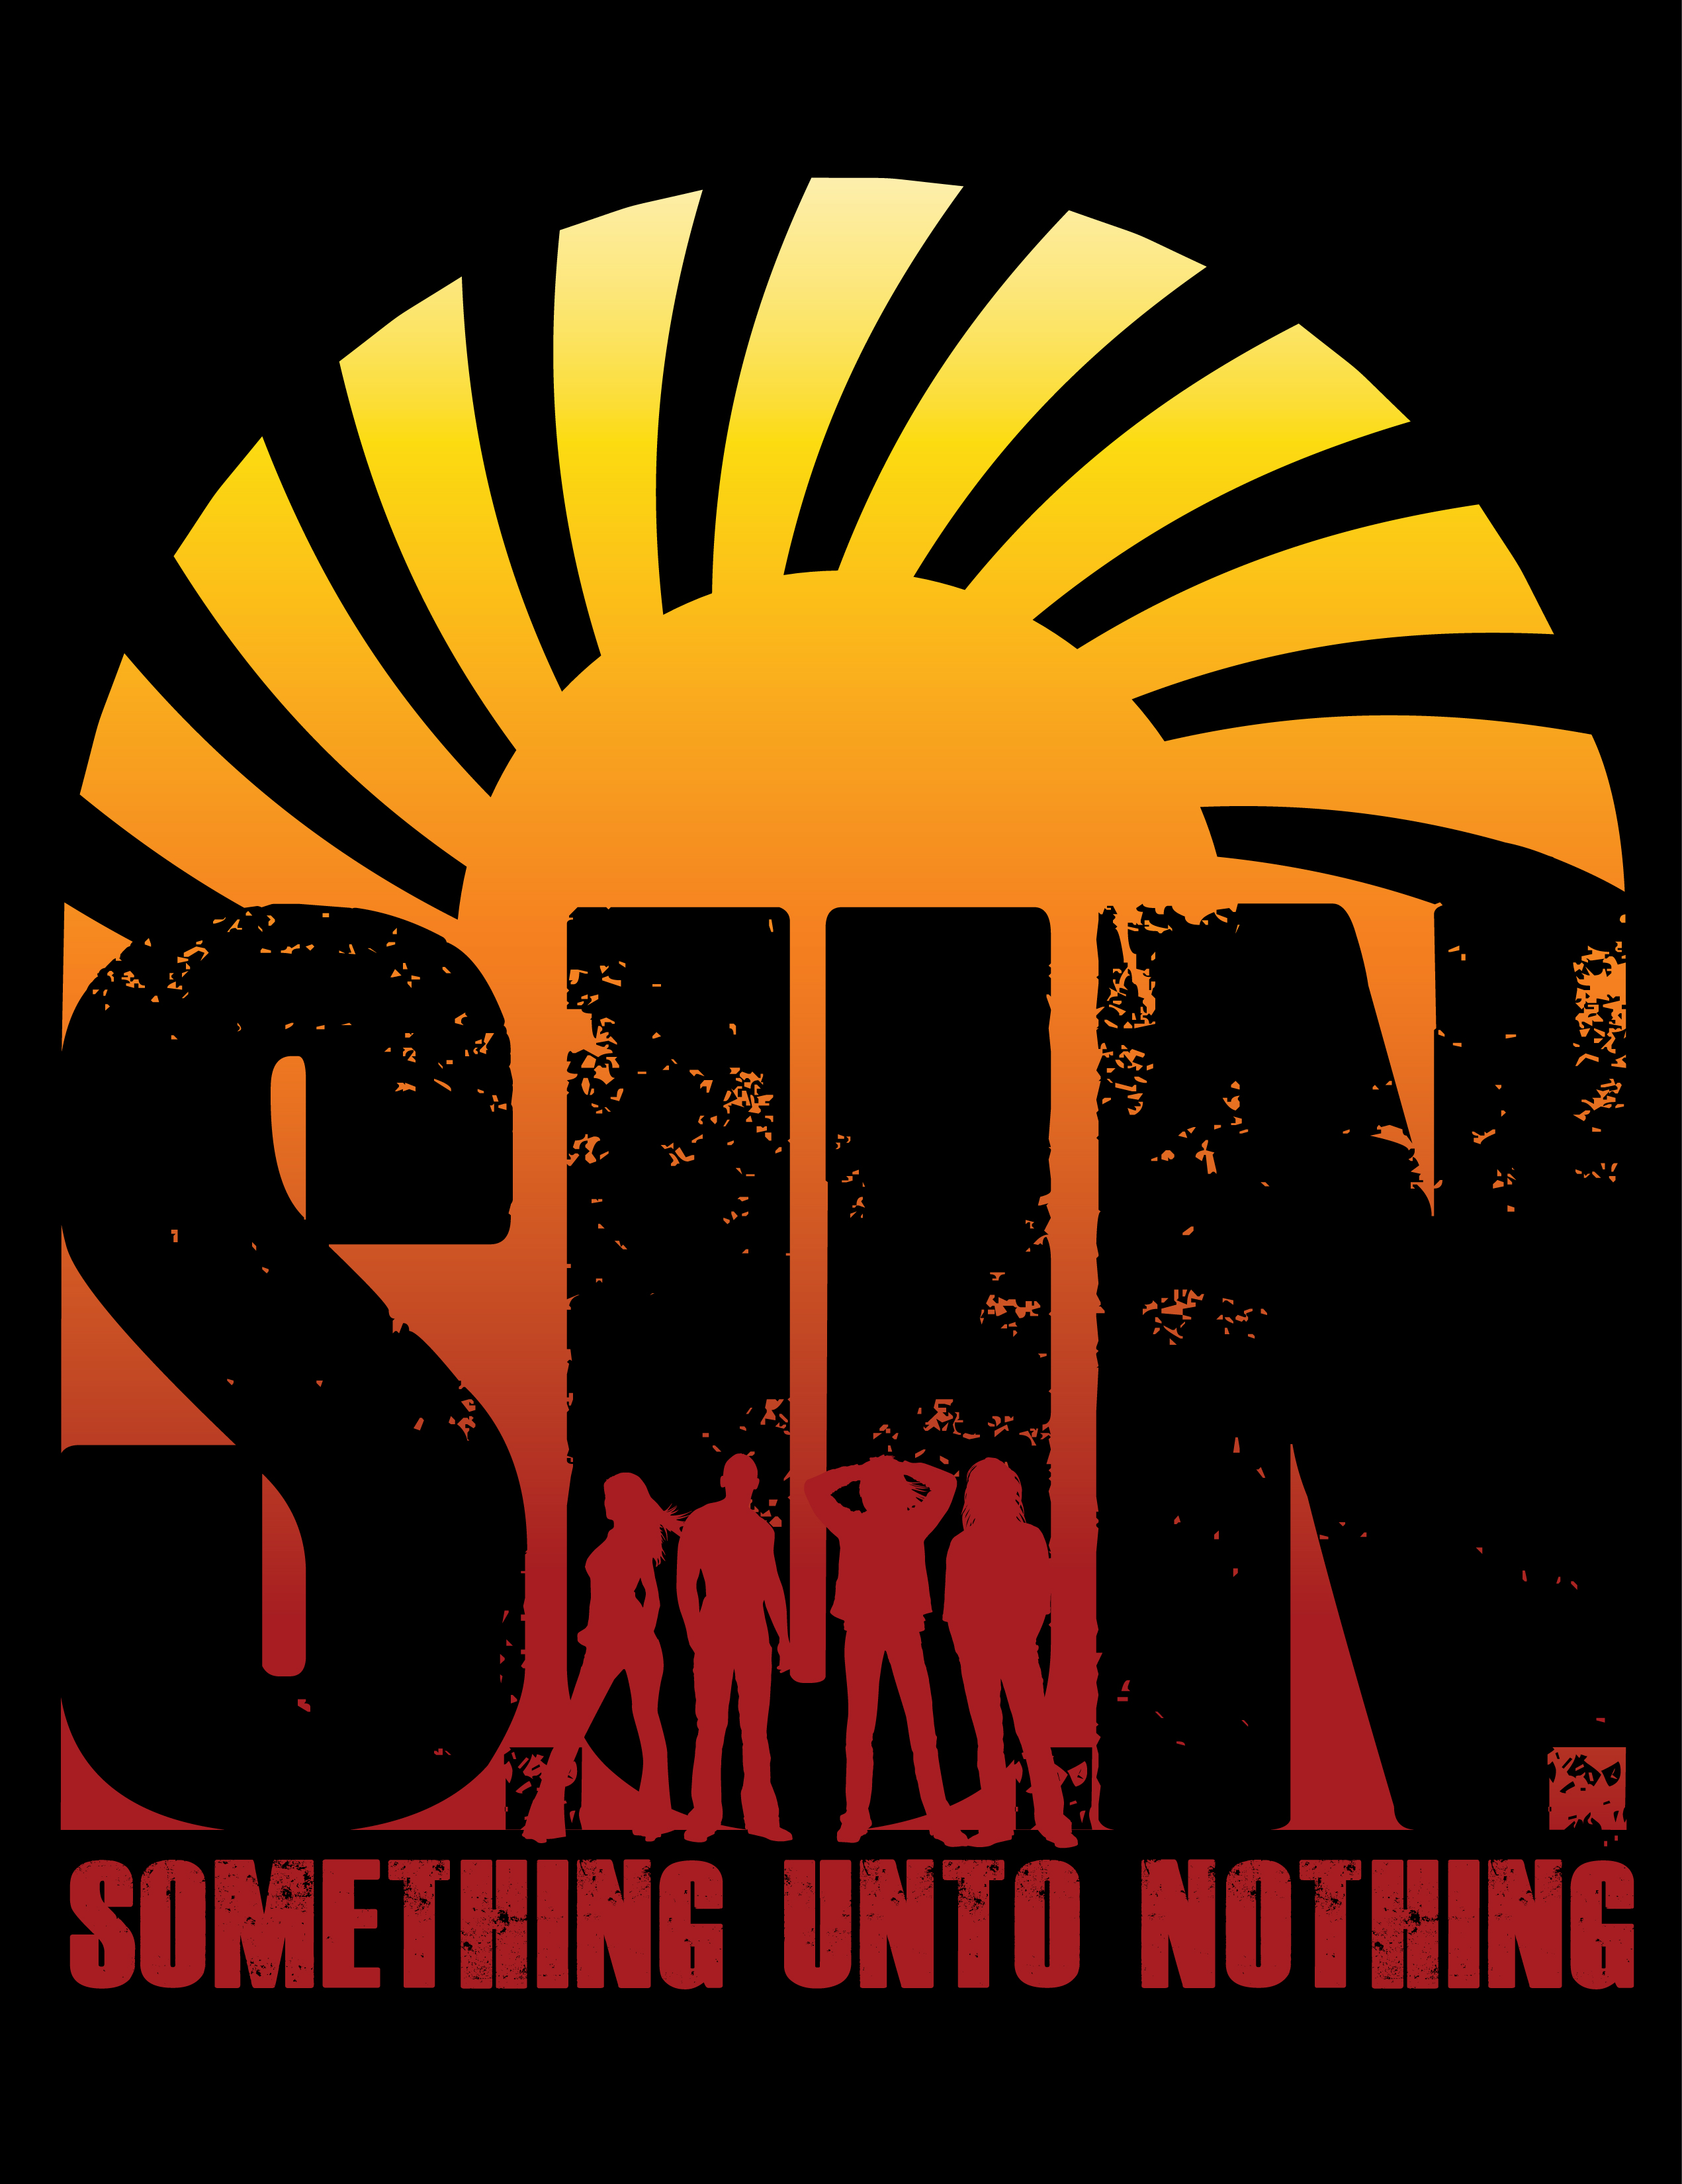 S.U.N. - Something Unto Nothing